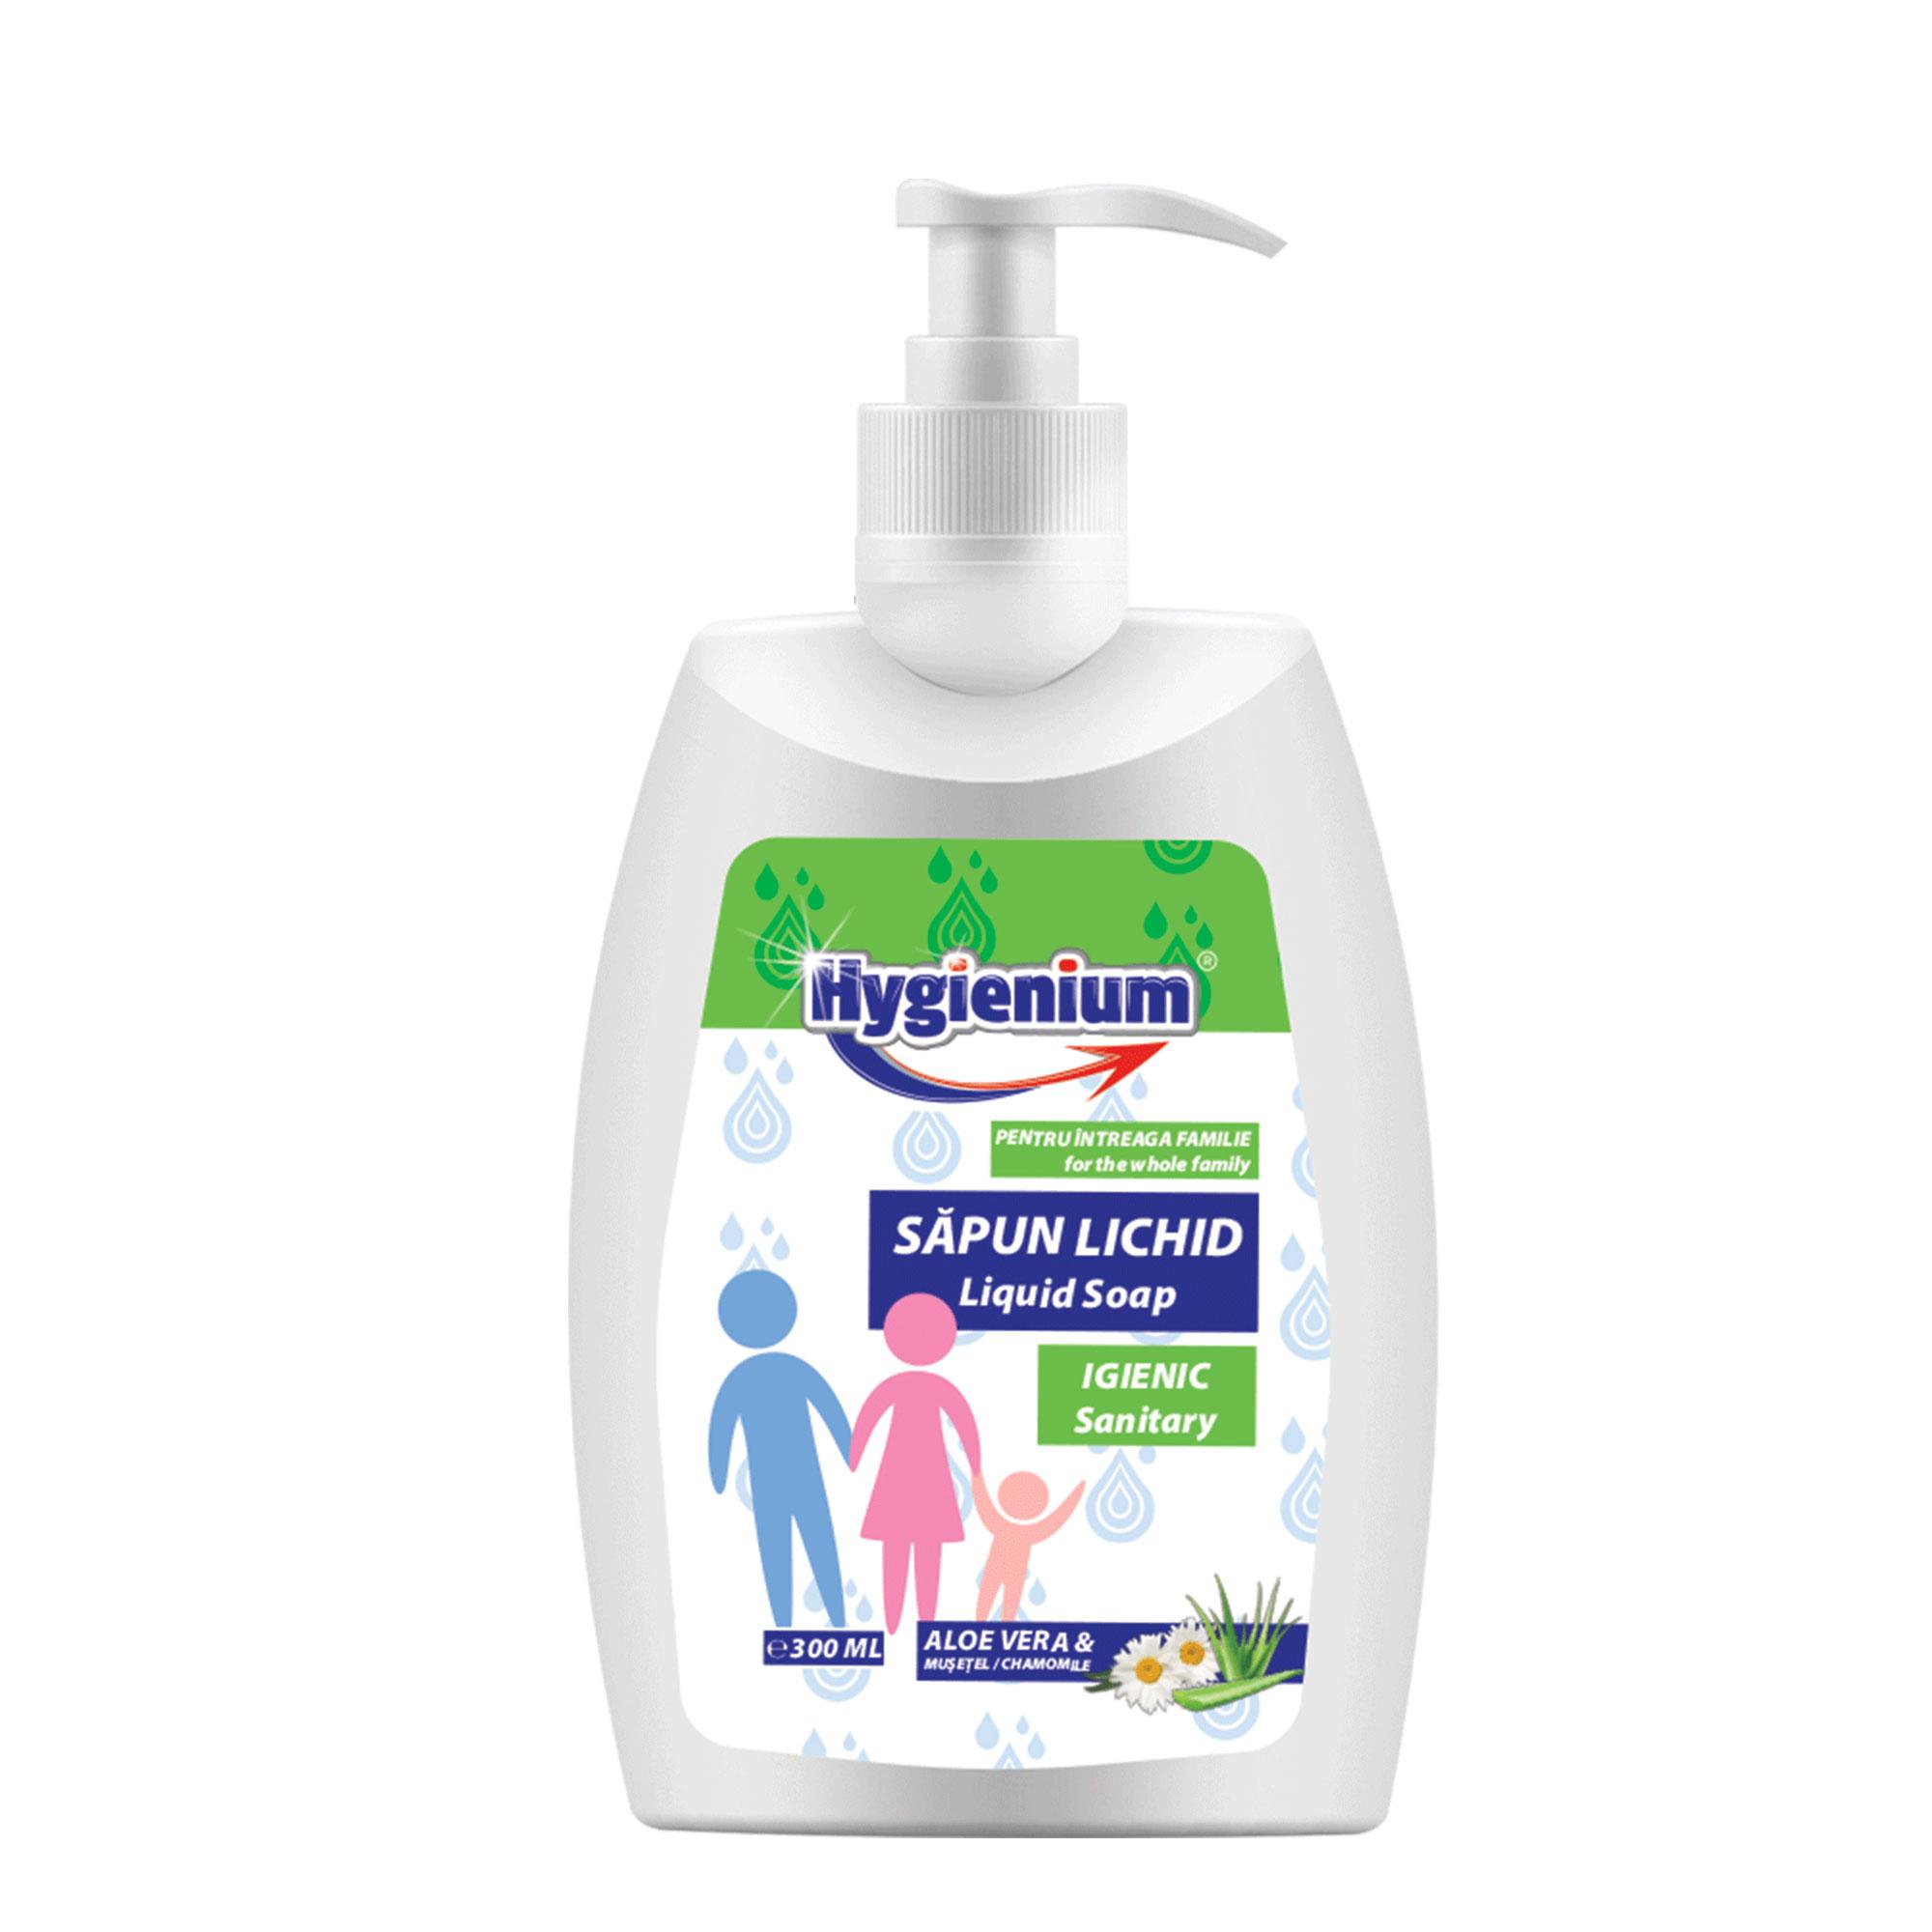 Hygienium sapun lichid aloe vera & musetel